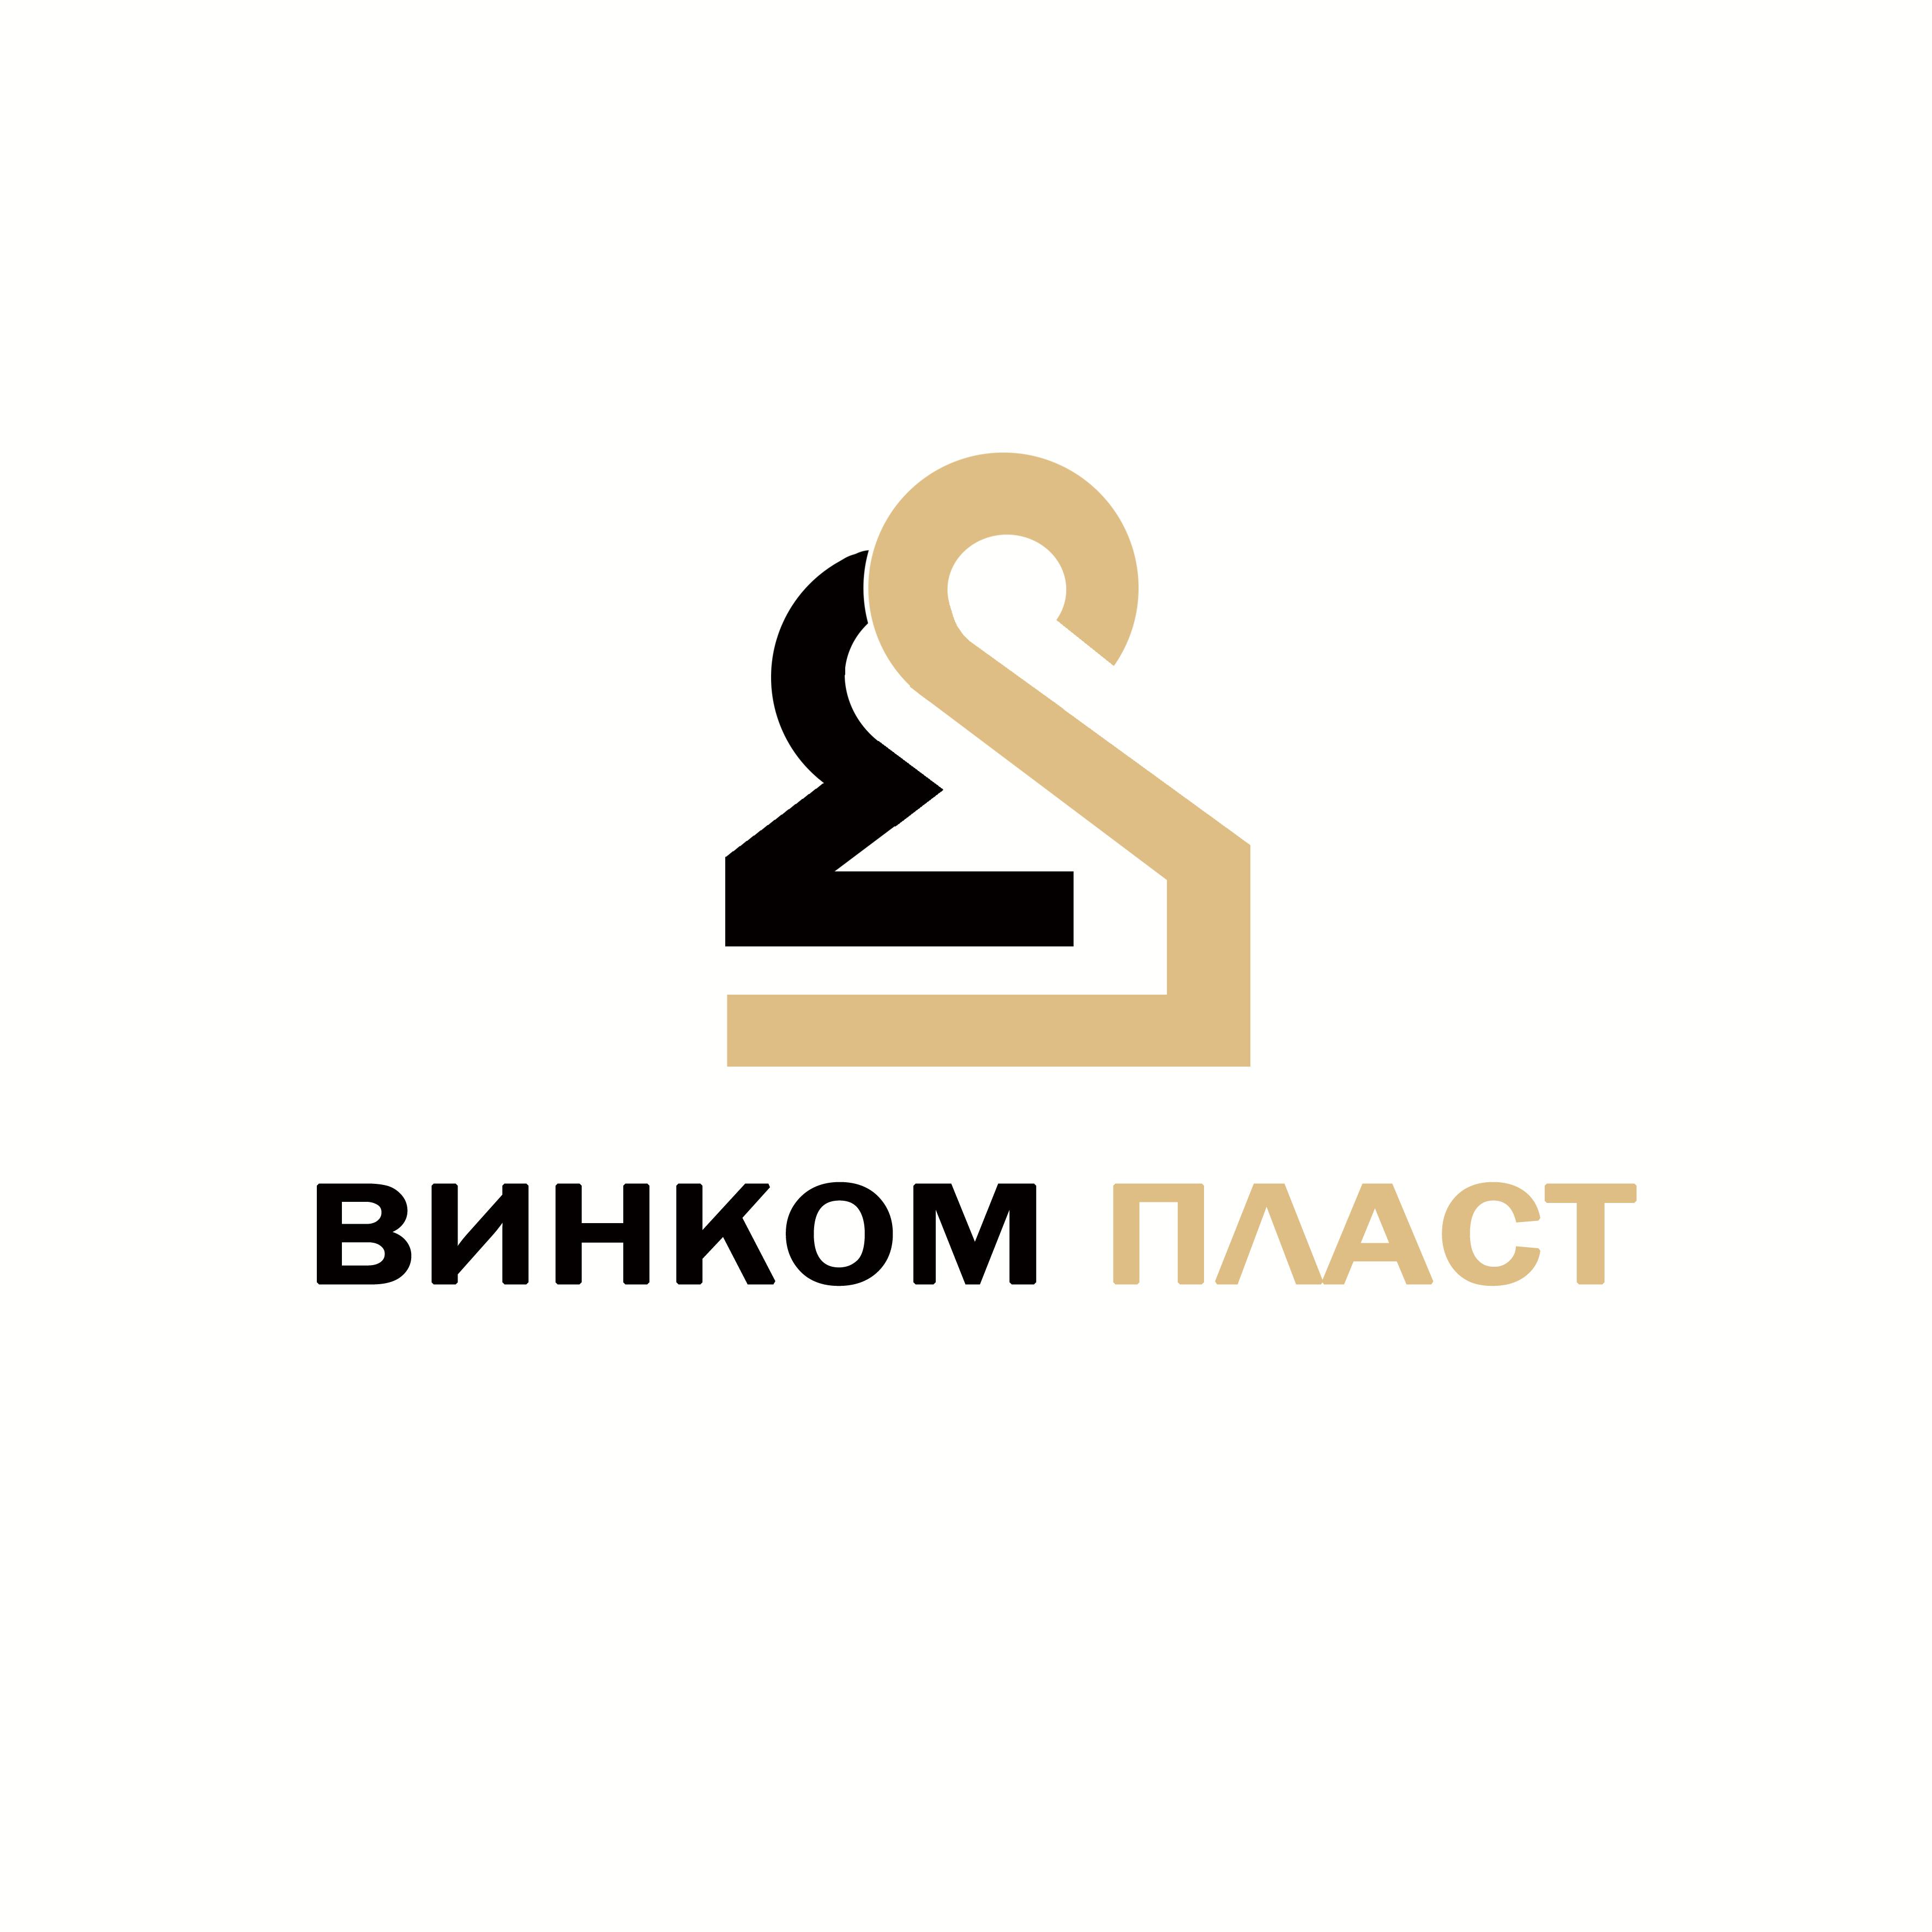 Логотип, фавикон и визитка для компании Винком Пласт  фото f_9945c35d250c38a2.jpg